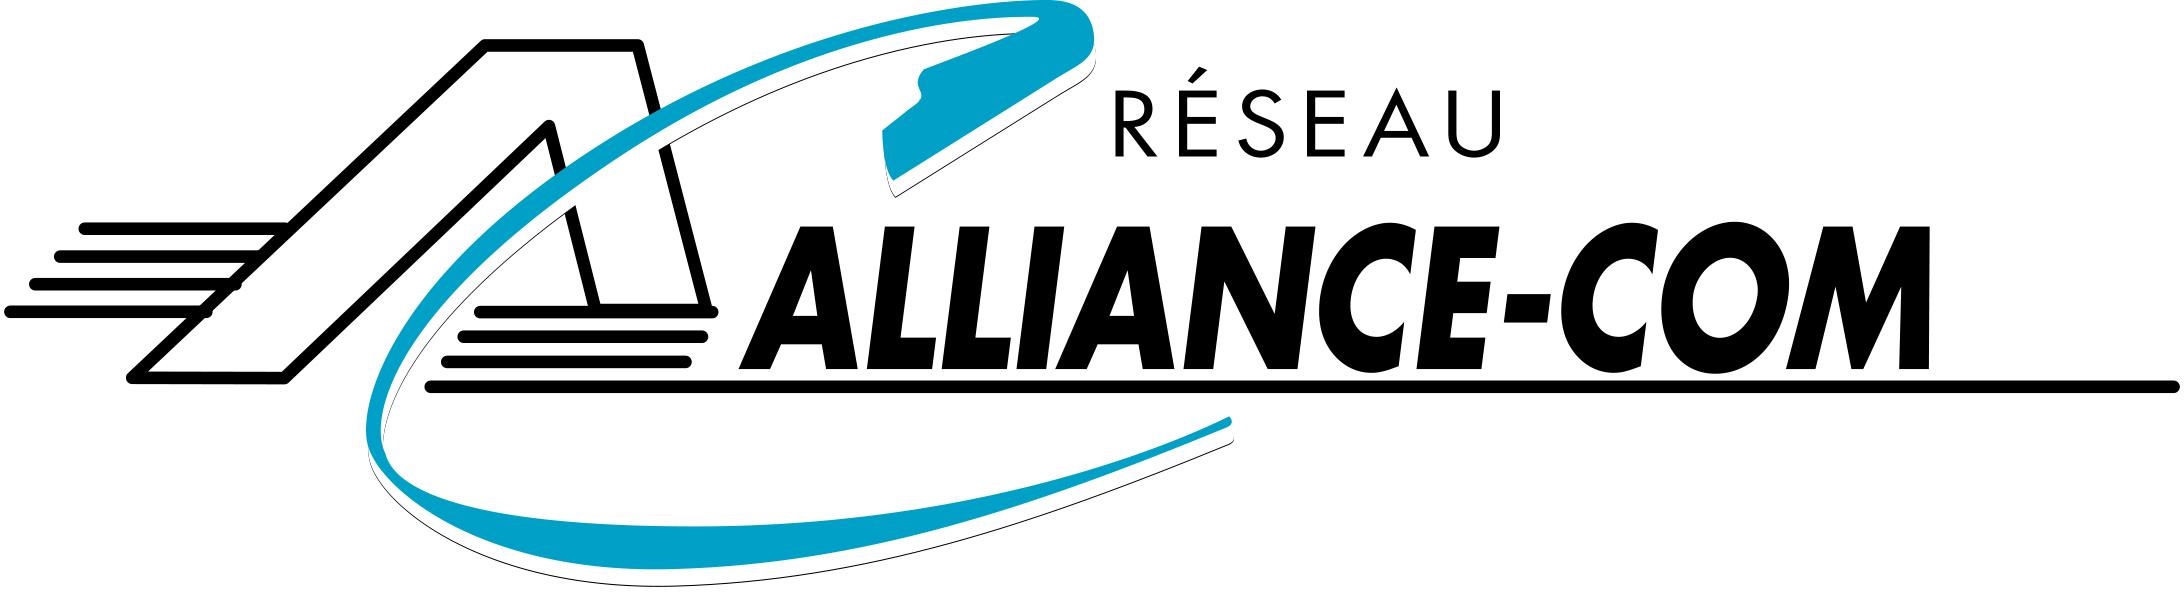 Alliance-Com